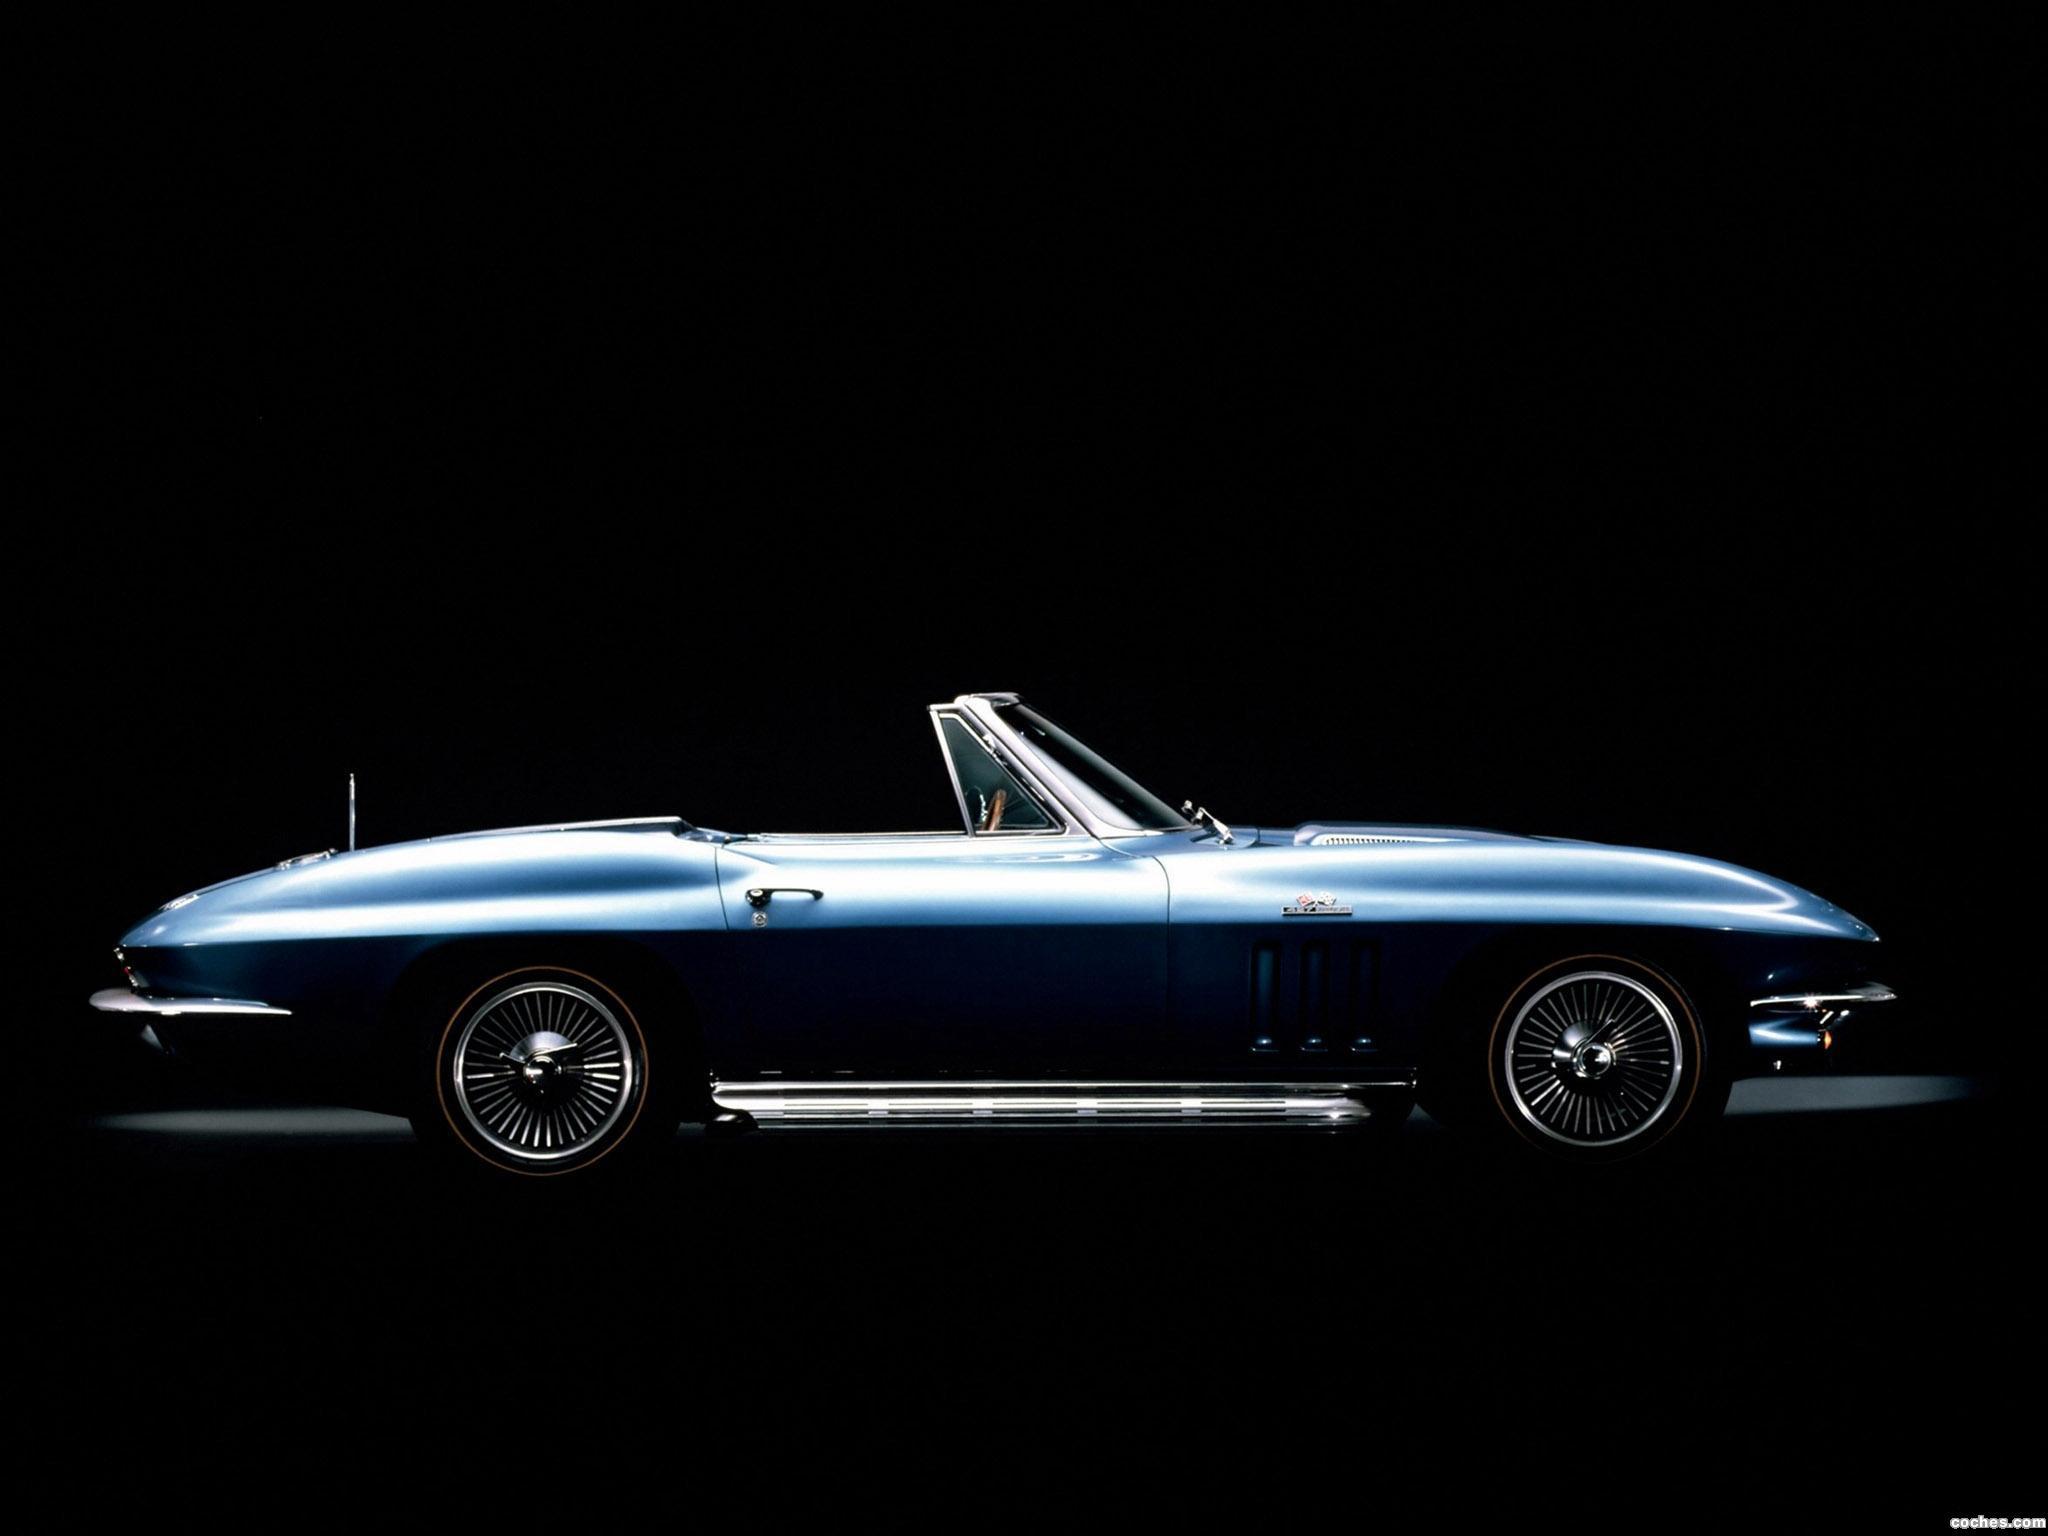 Foto 2 de Chevrolet C2 Sting Ray Convertible 1965